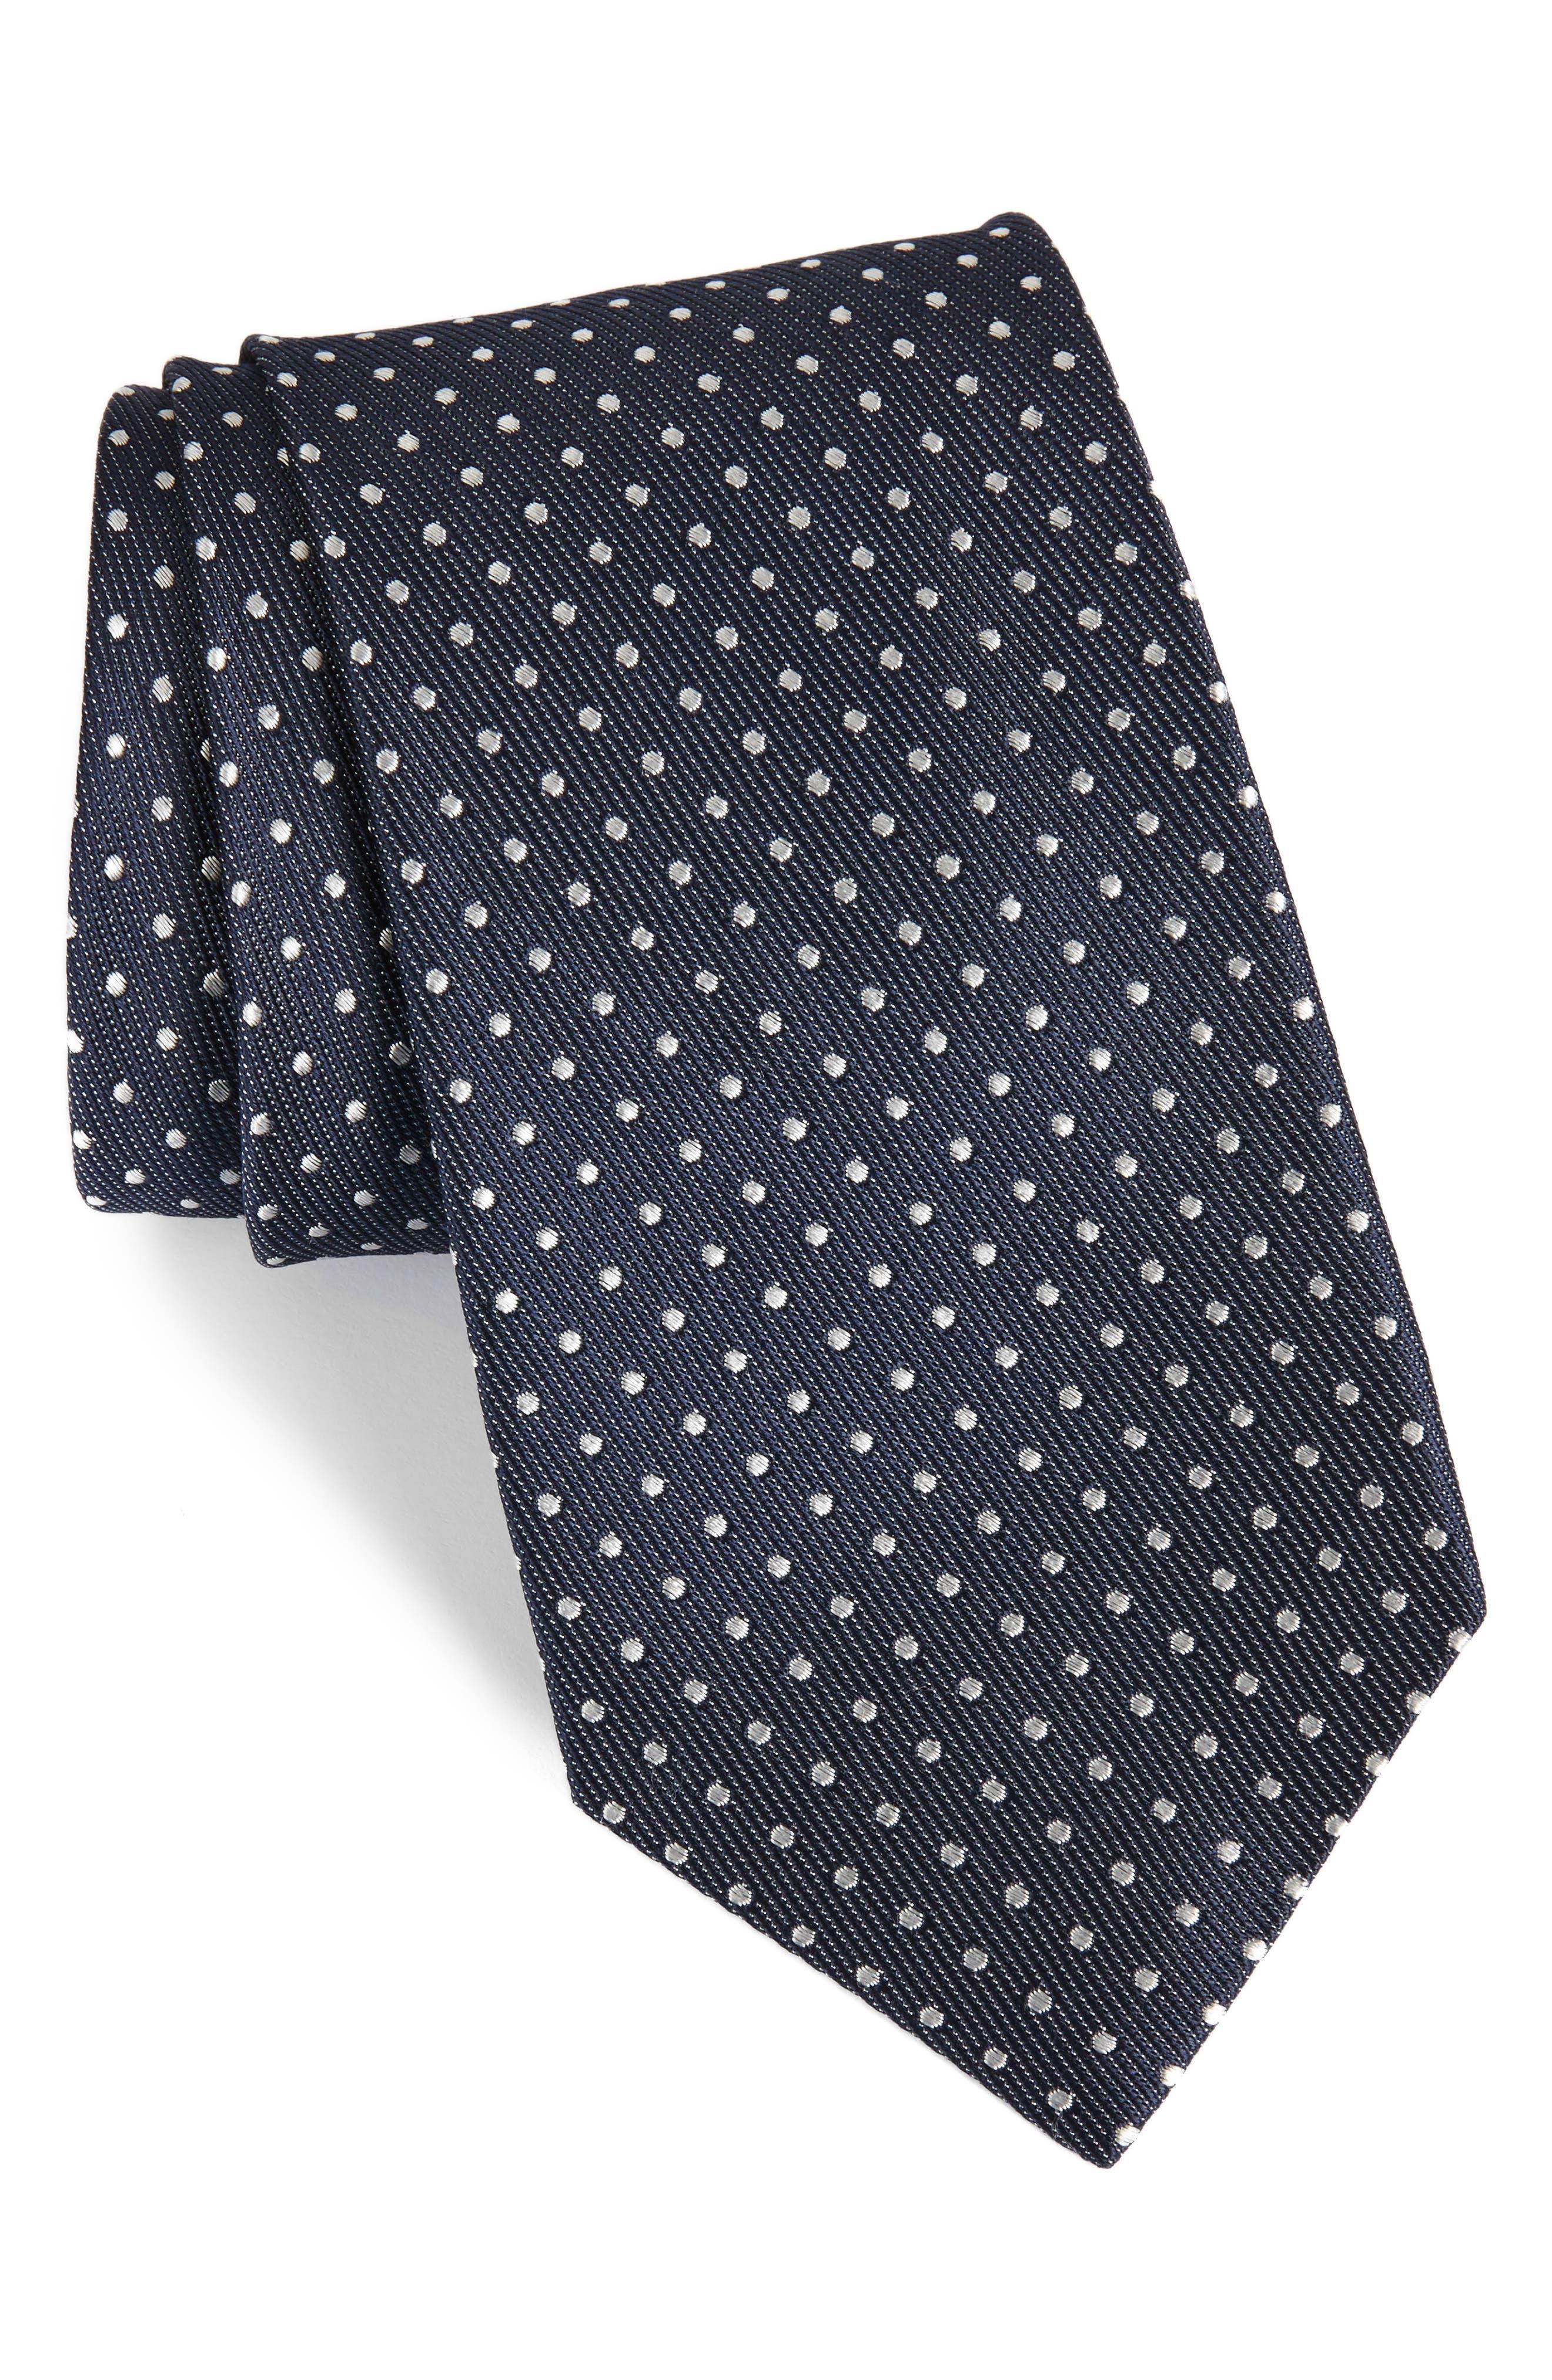 Sturridge Dot Silk Tie,                         Main,                         color, NAVY